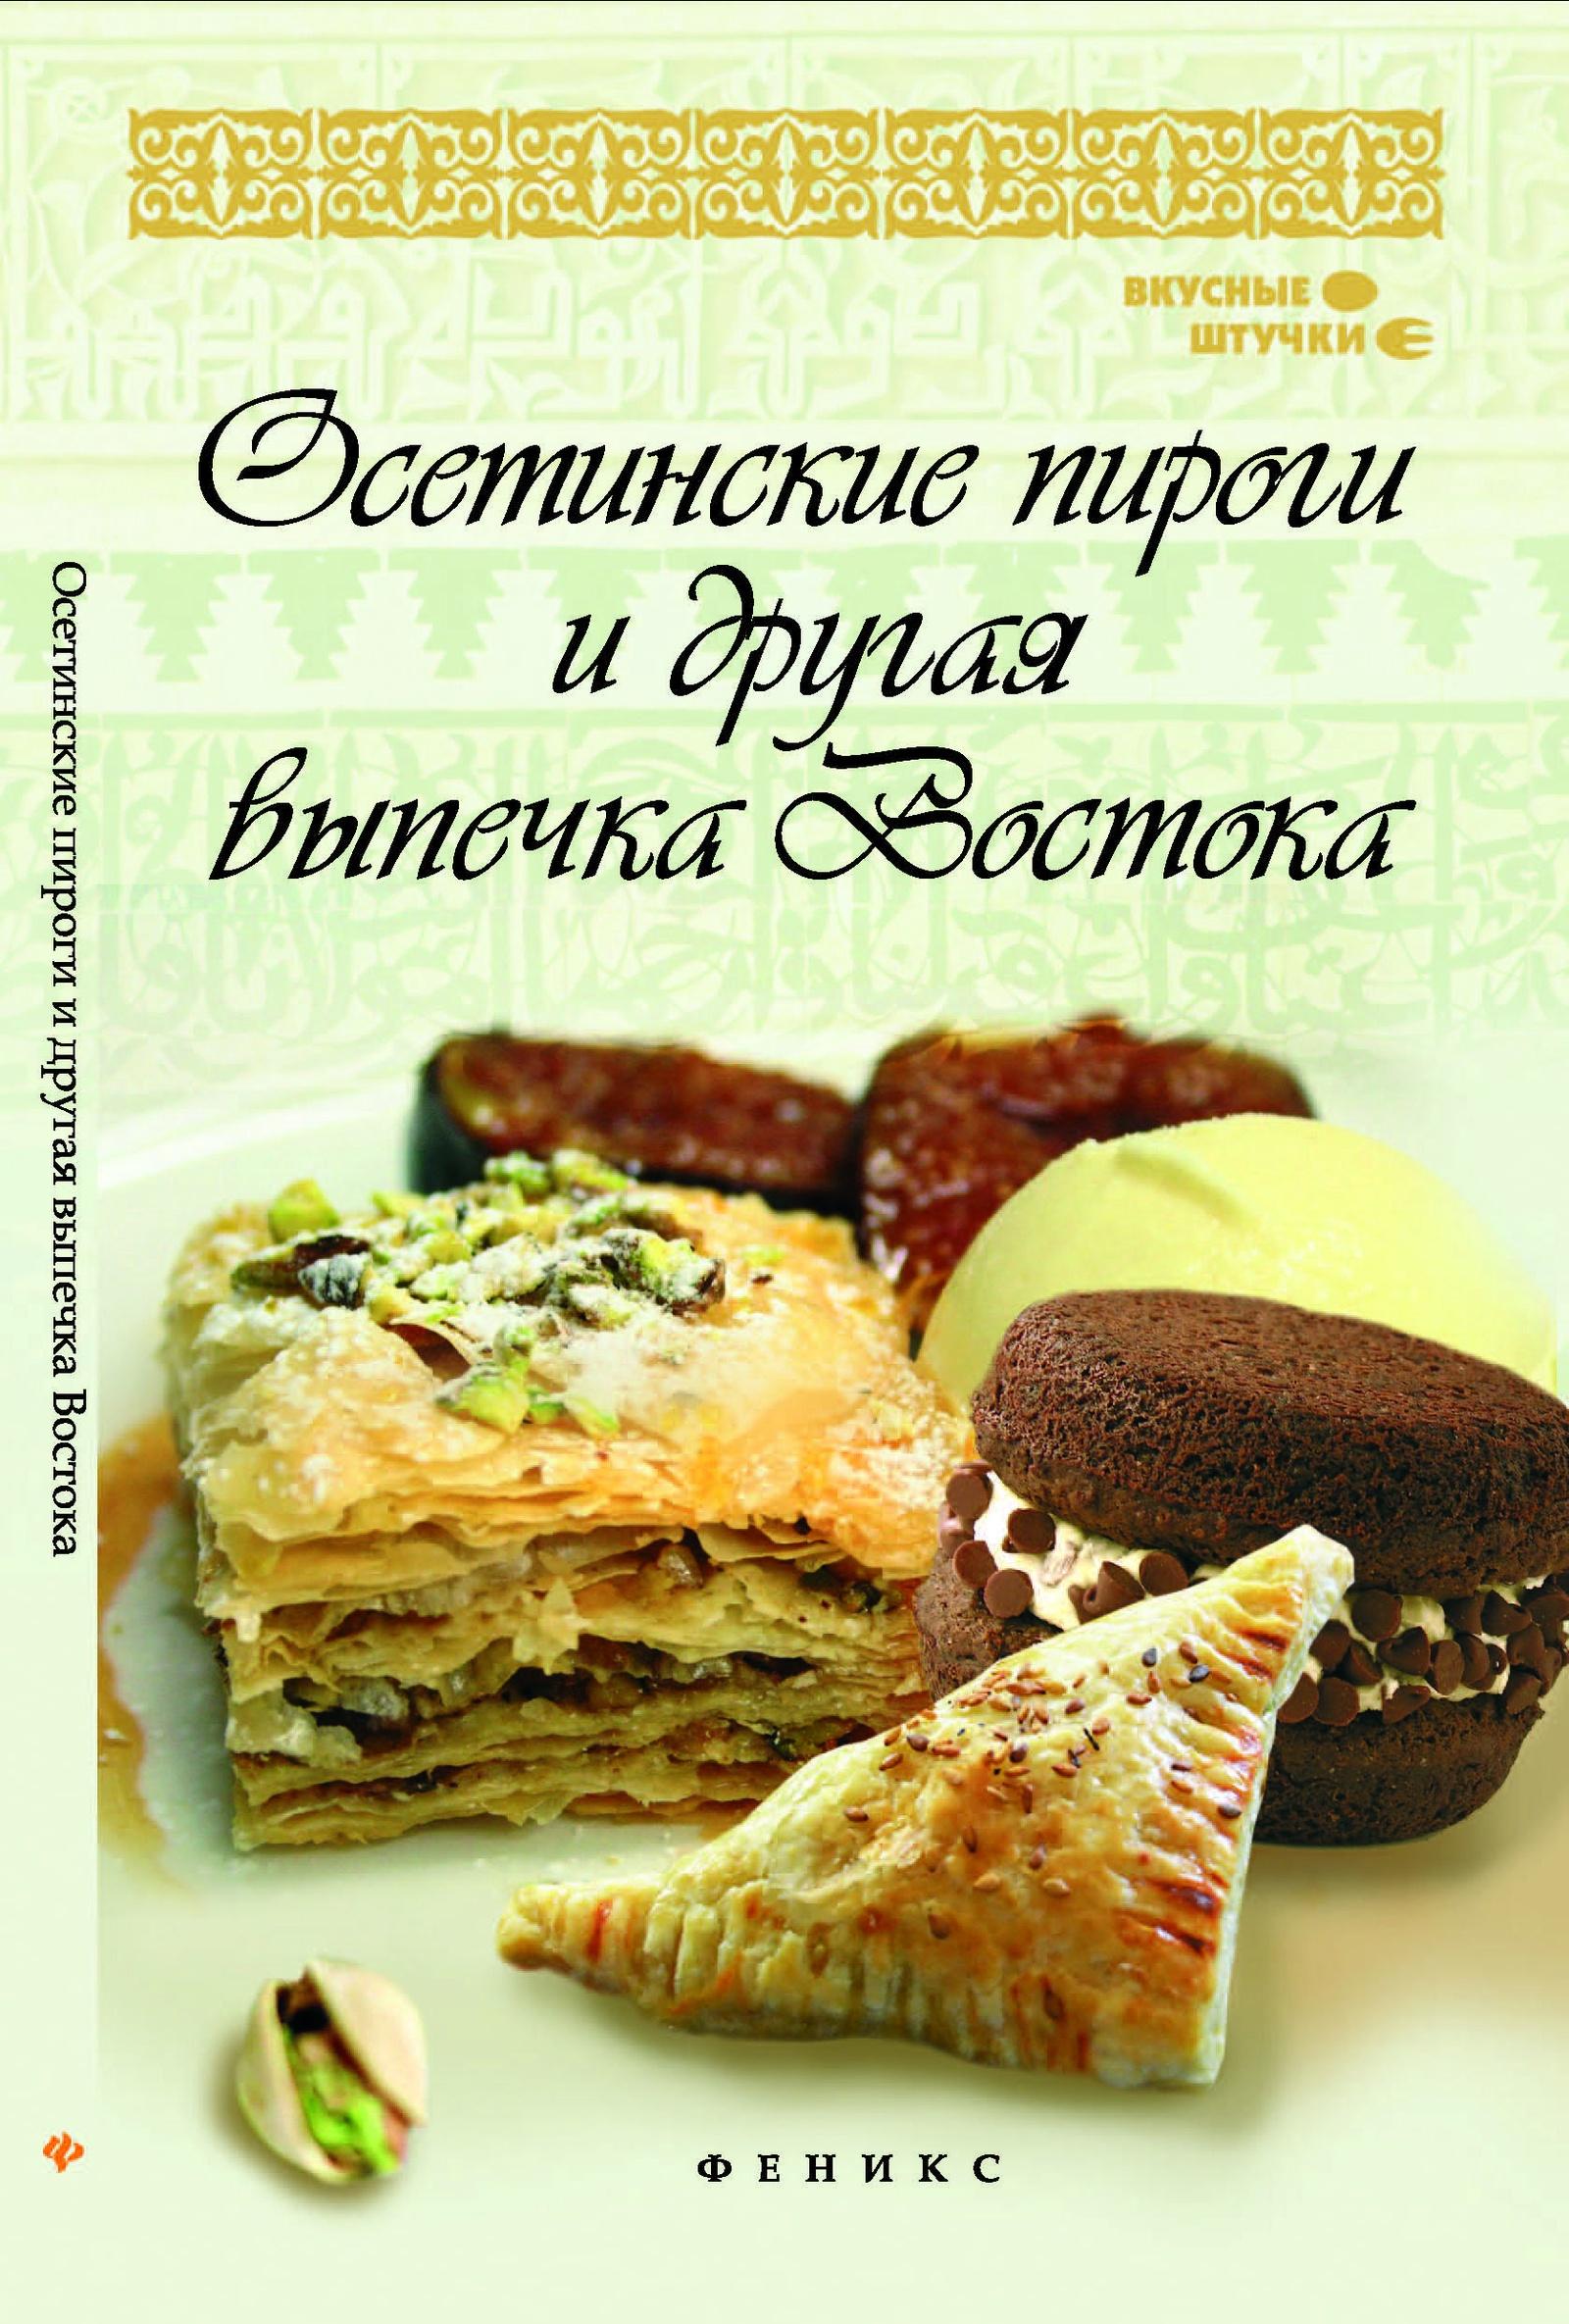 Осетинские пироги и другая выпечка Востока. - Изд. 3-е Феникс